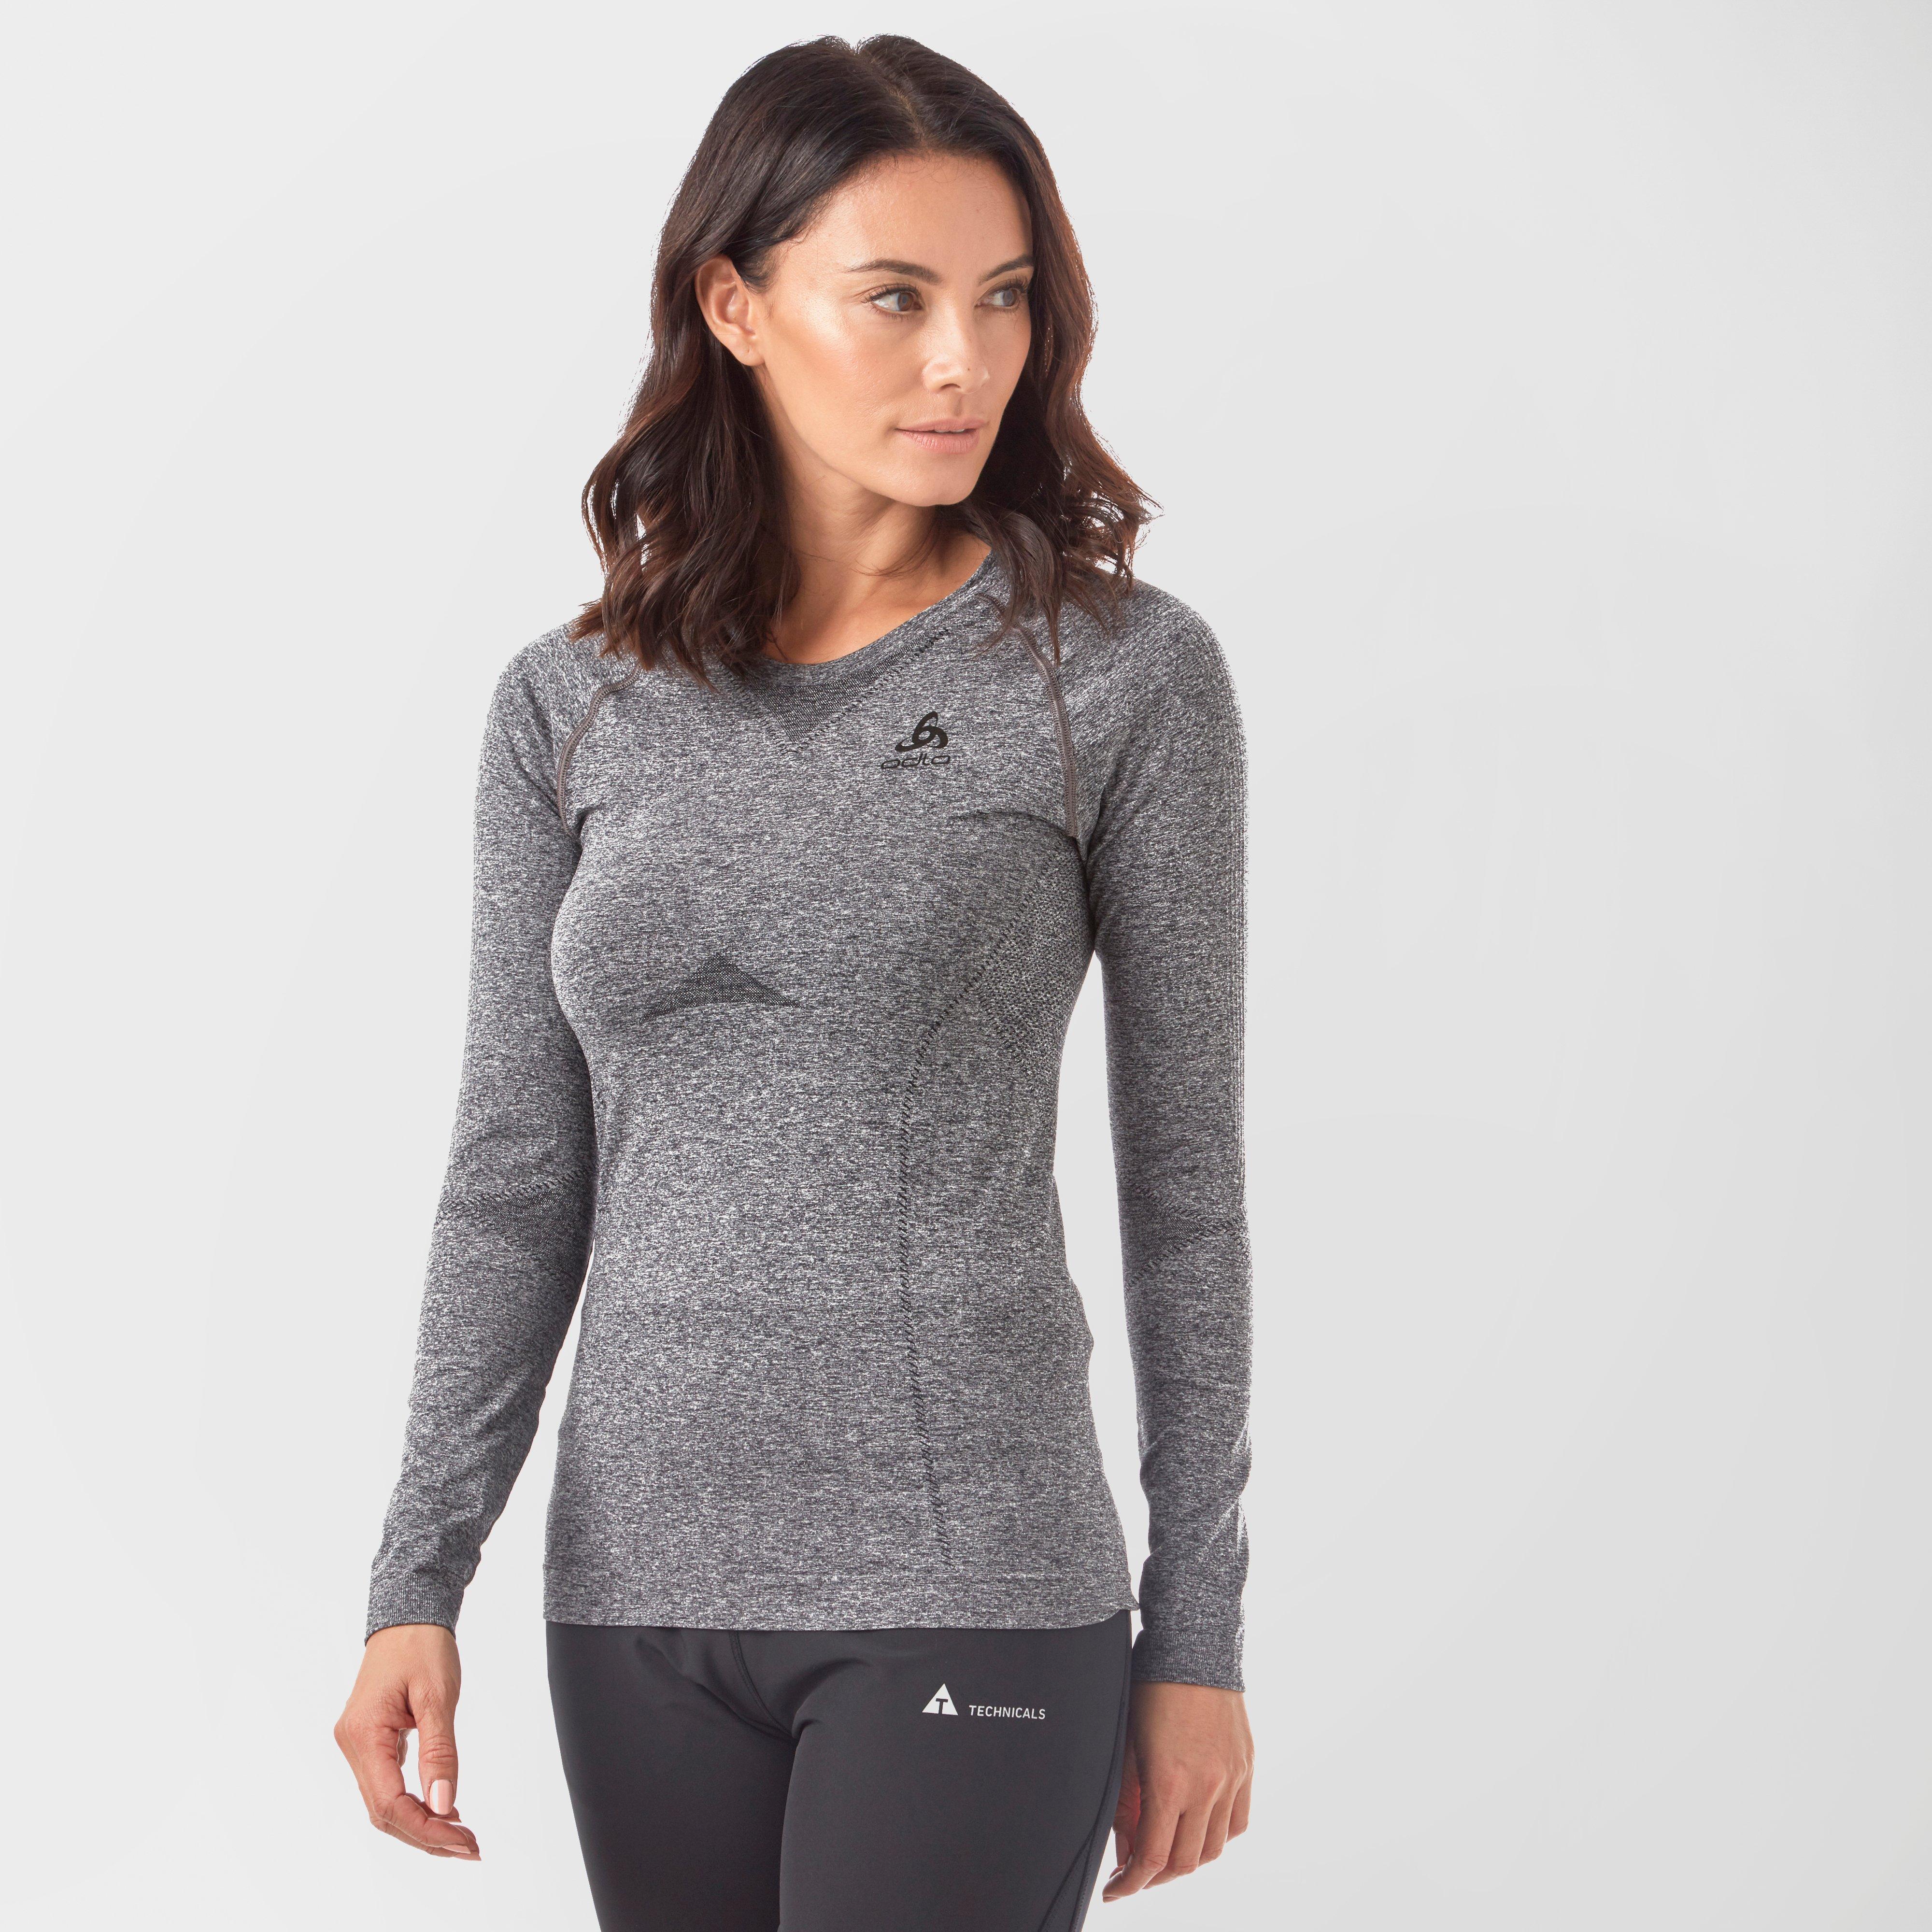 Odlo Odlo Womens SUW Performance Light Long Sleeve Baselayer - Grey, Grey